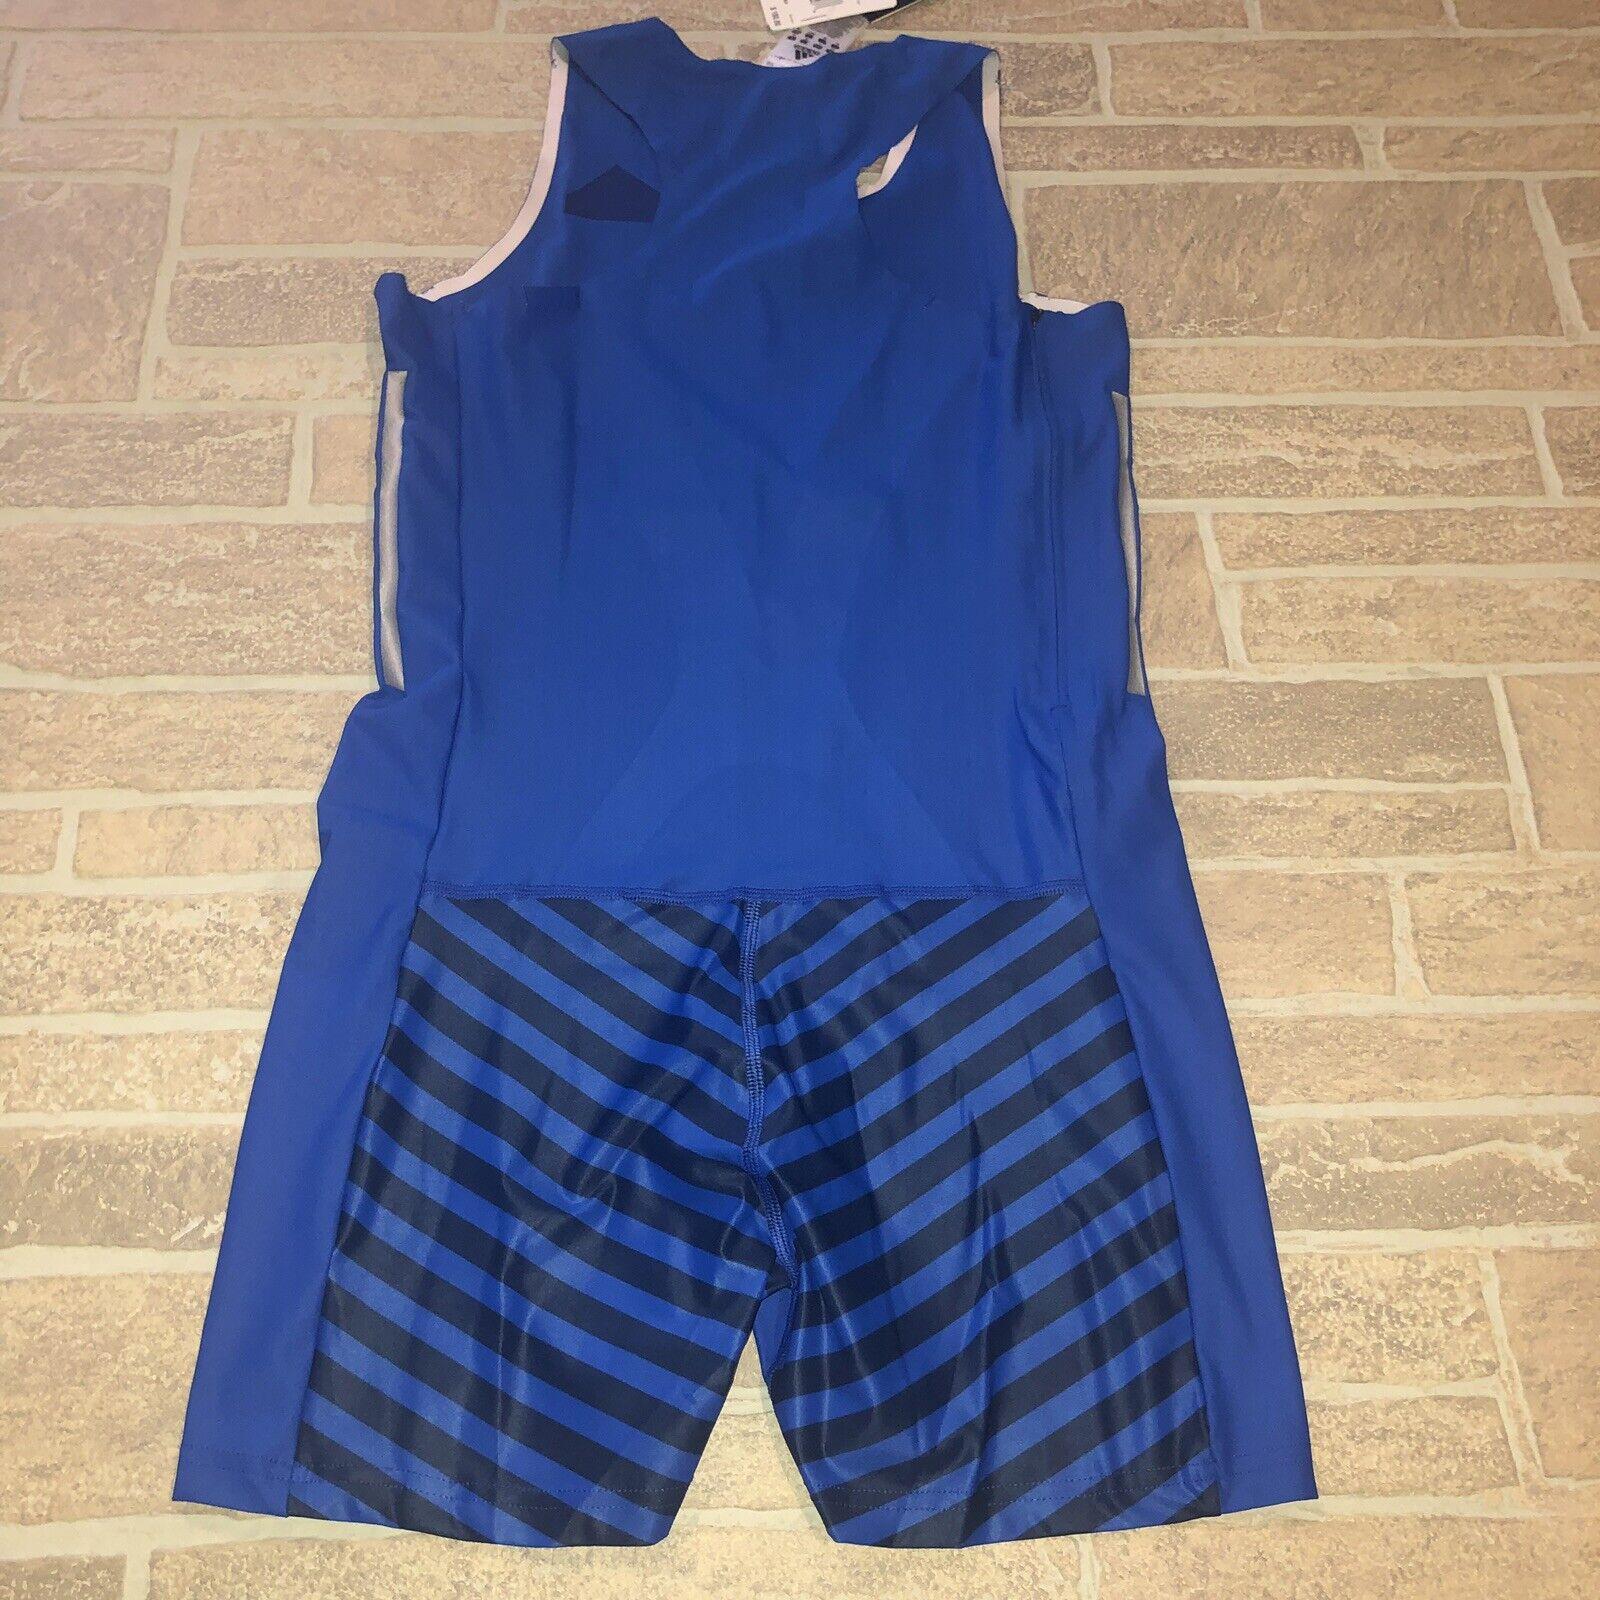 New ADIDAS LEOTARD women one-piece gymnastics Climalite shorts bluee L MSRP